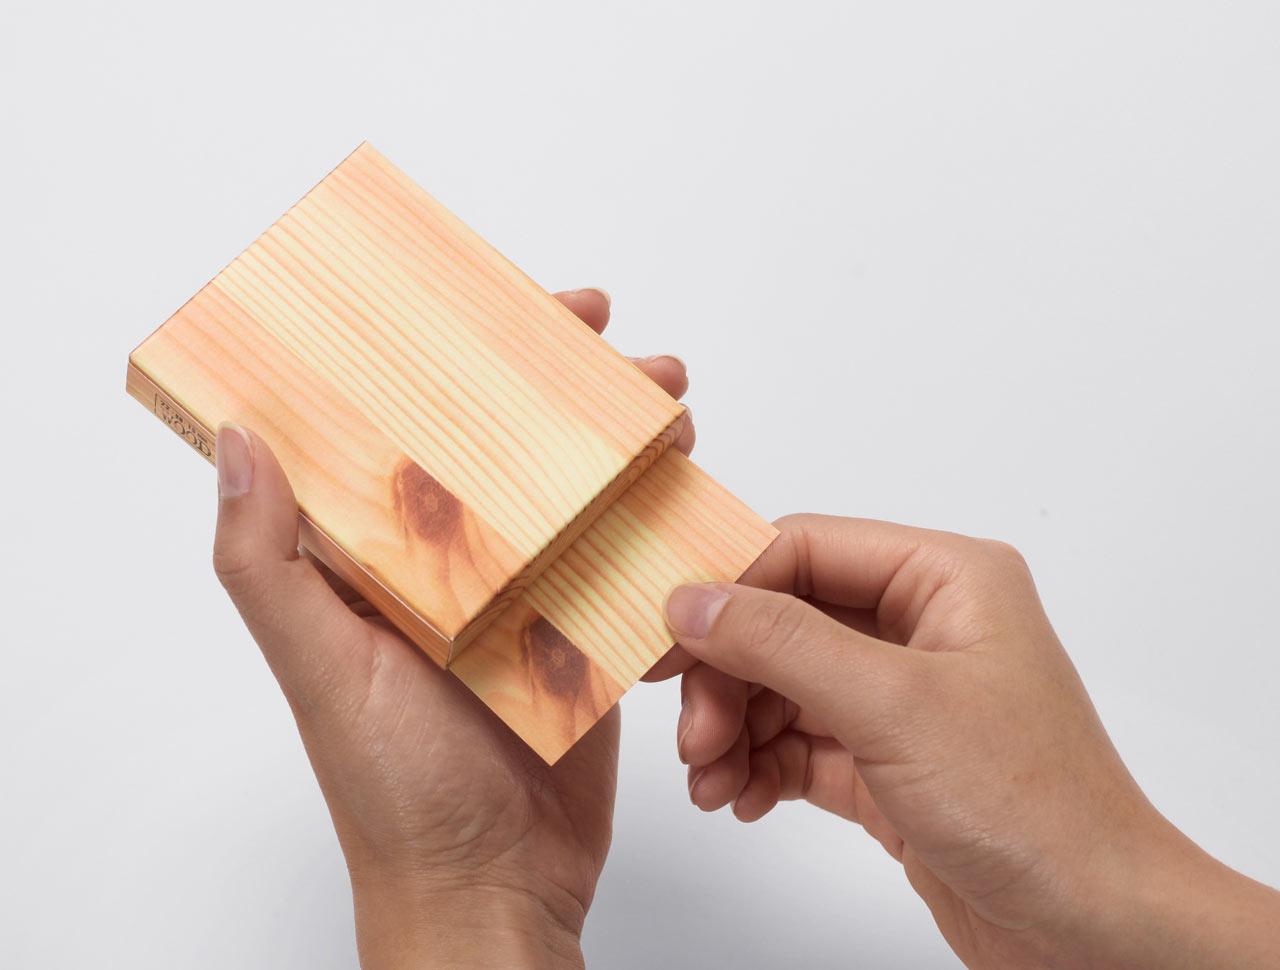 wood-block-memo-pad-appree-6b